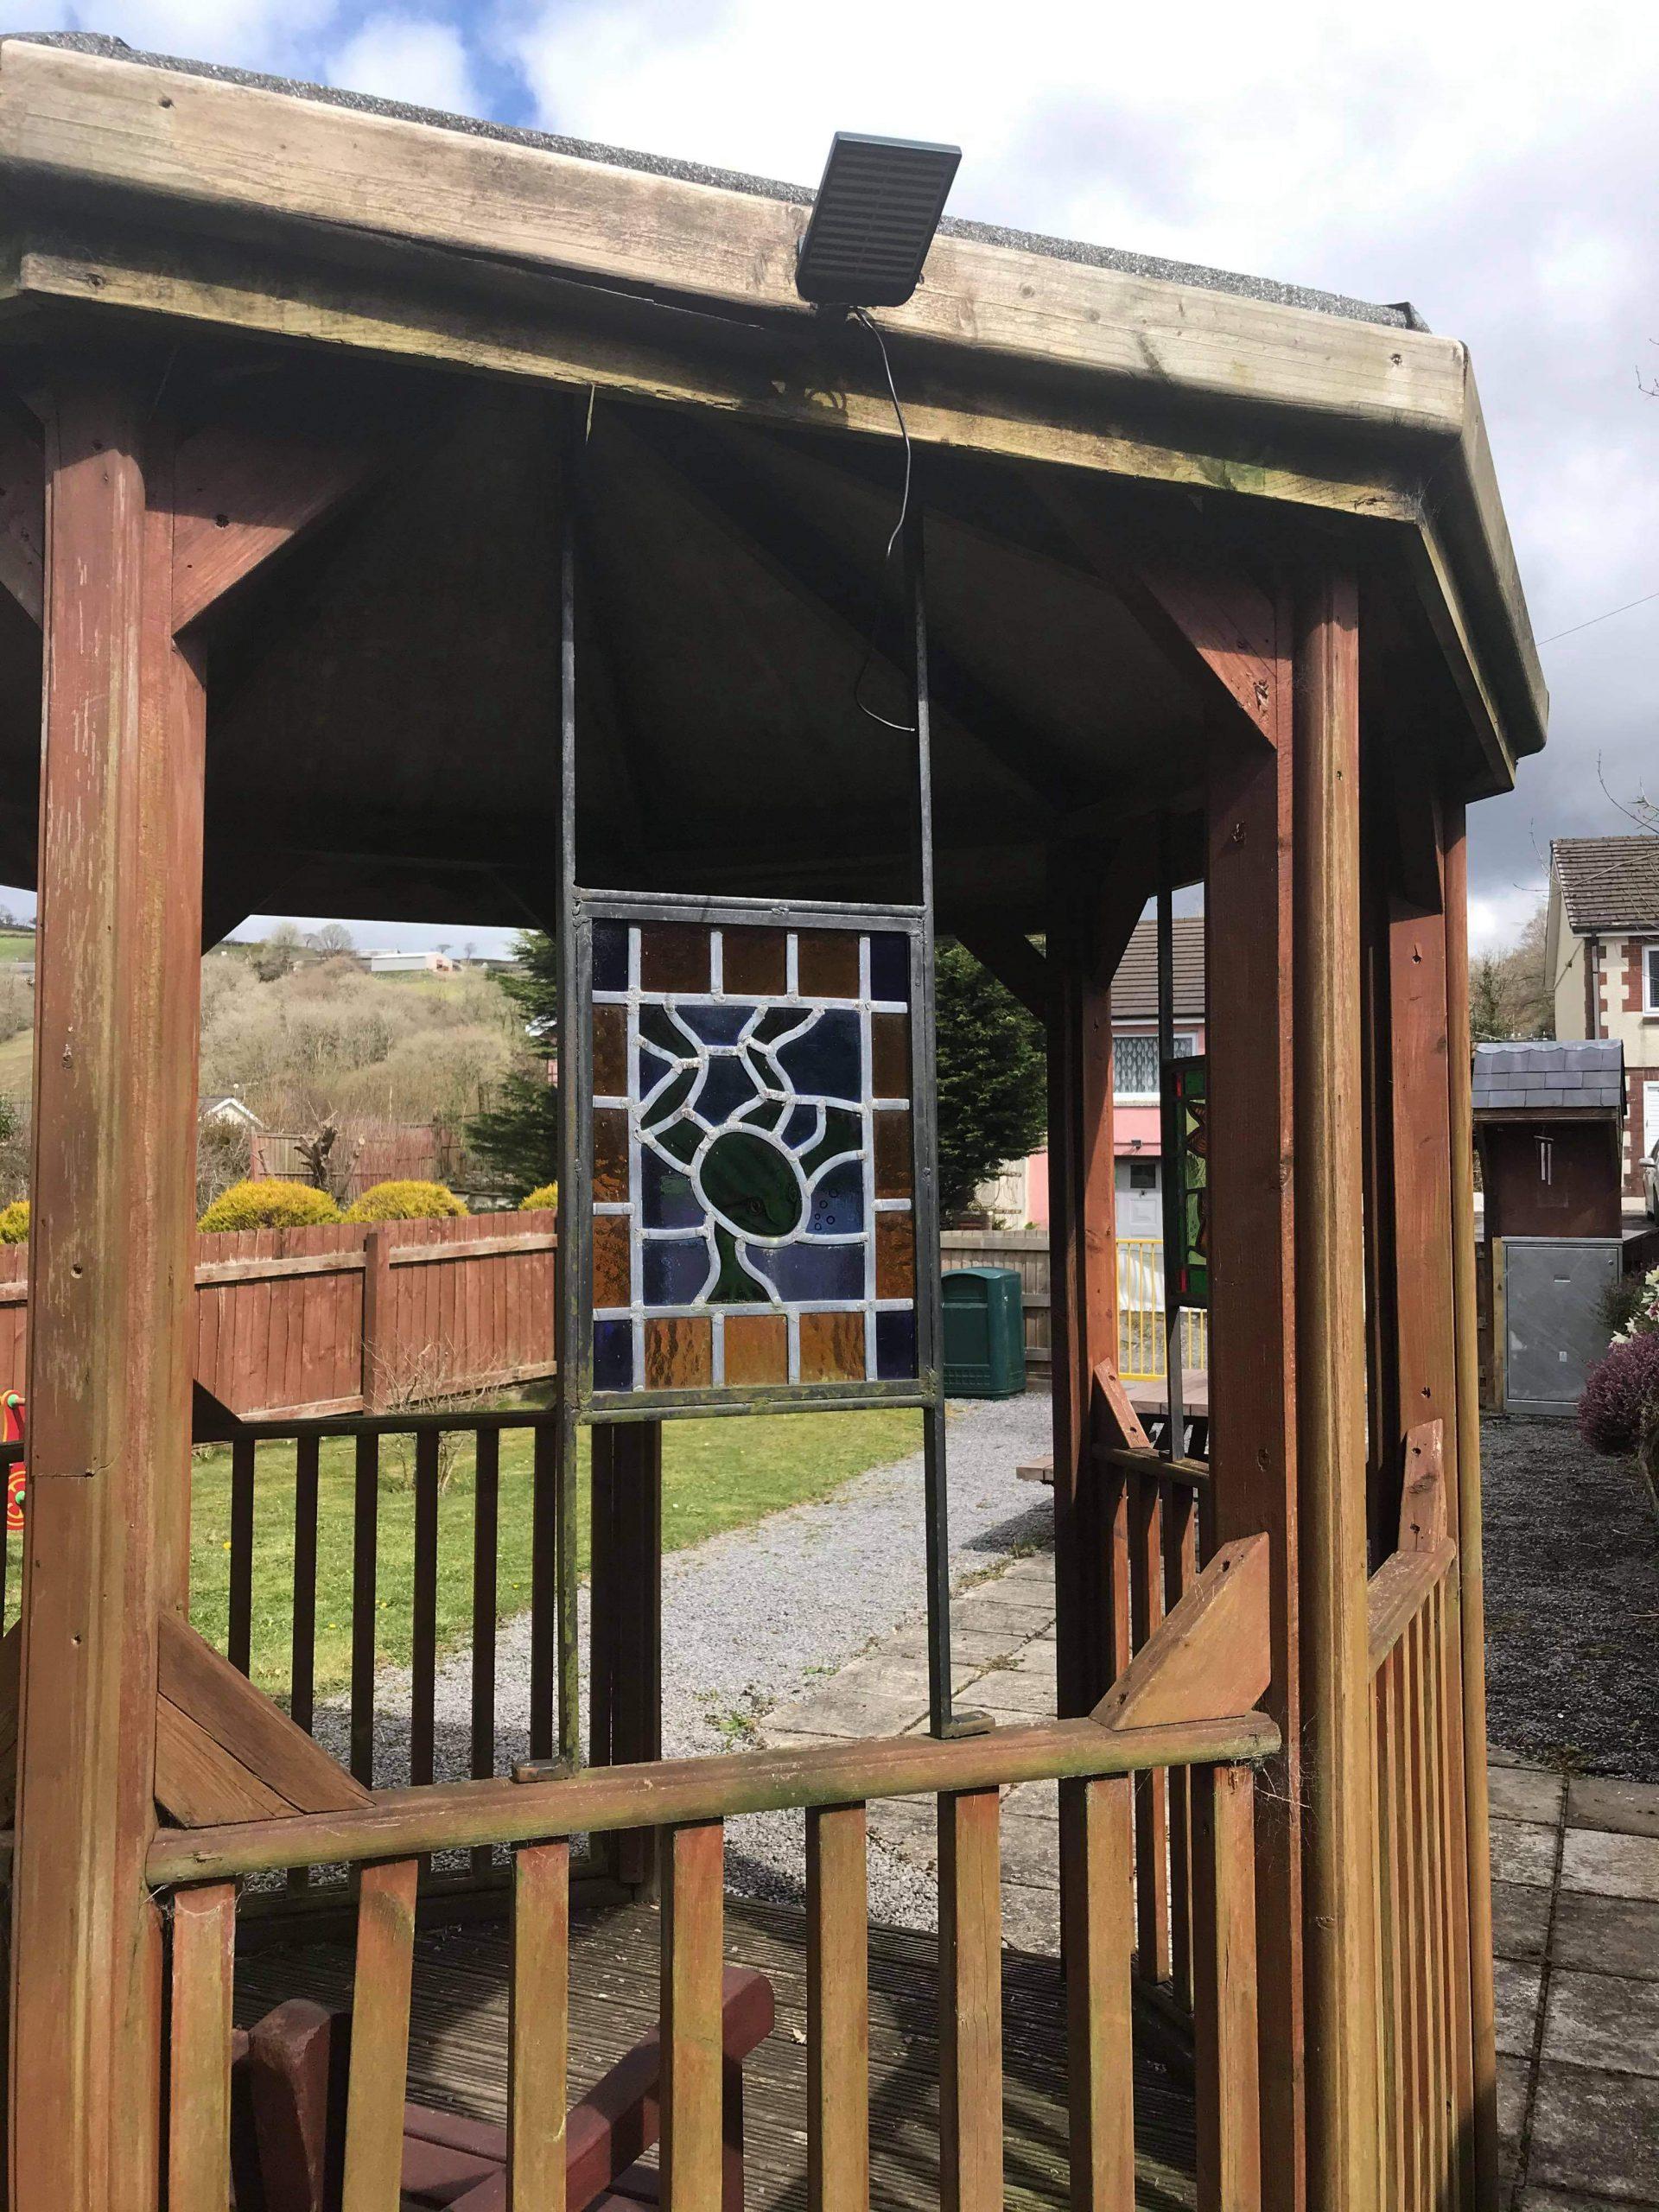 Llanfynydd Hall Plot-Llanfynydd Hall Plot 2 2